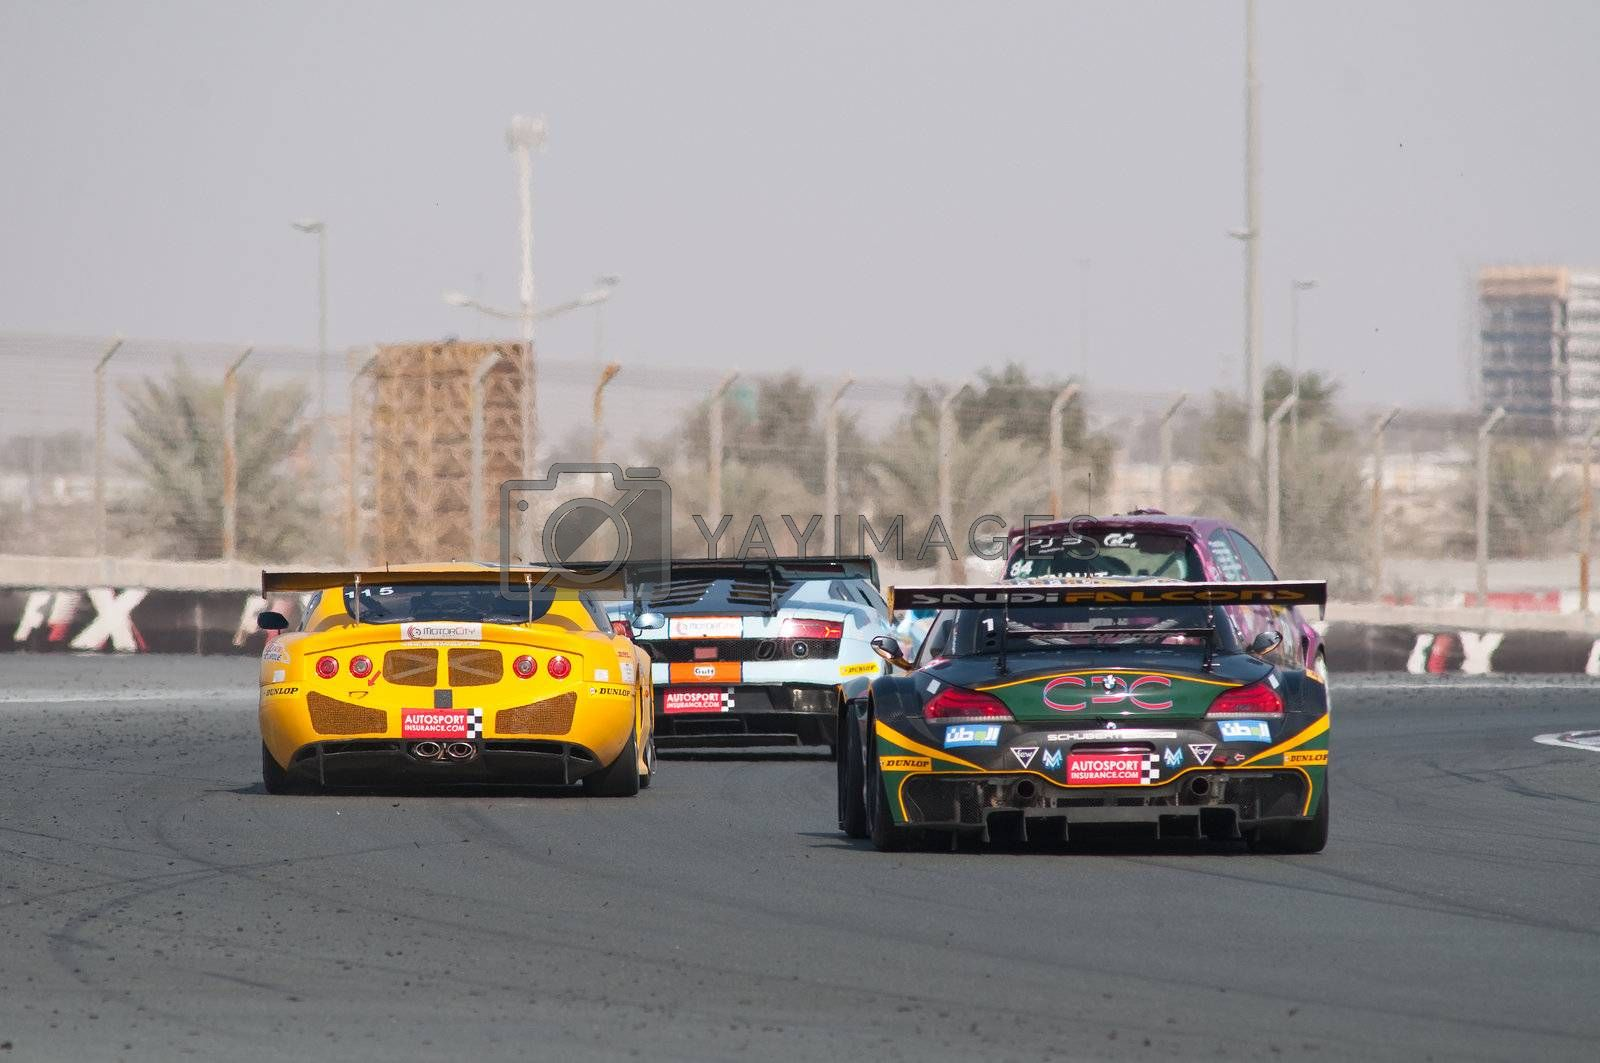 DUBAI - JANUARY 13: Rear of competitors at the 2012 Dunlop 24 Hour Race at Dubai Autodrome on January 13, 2012.